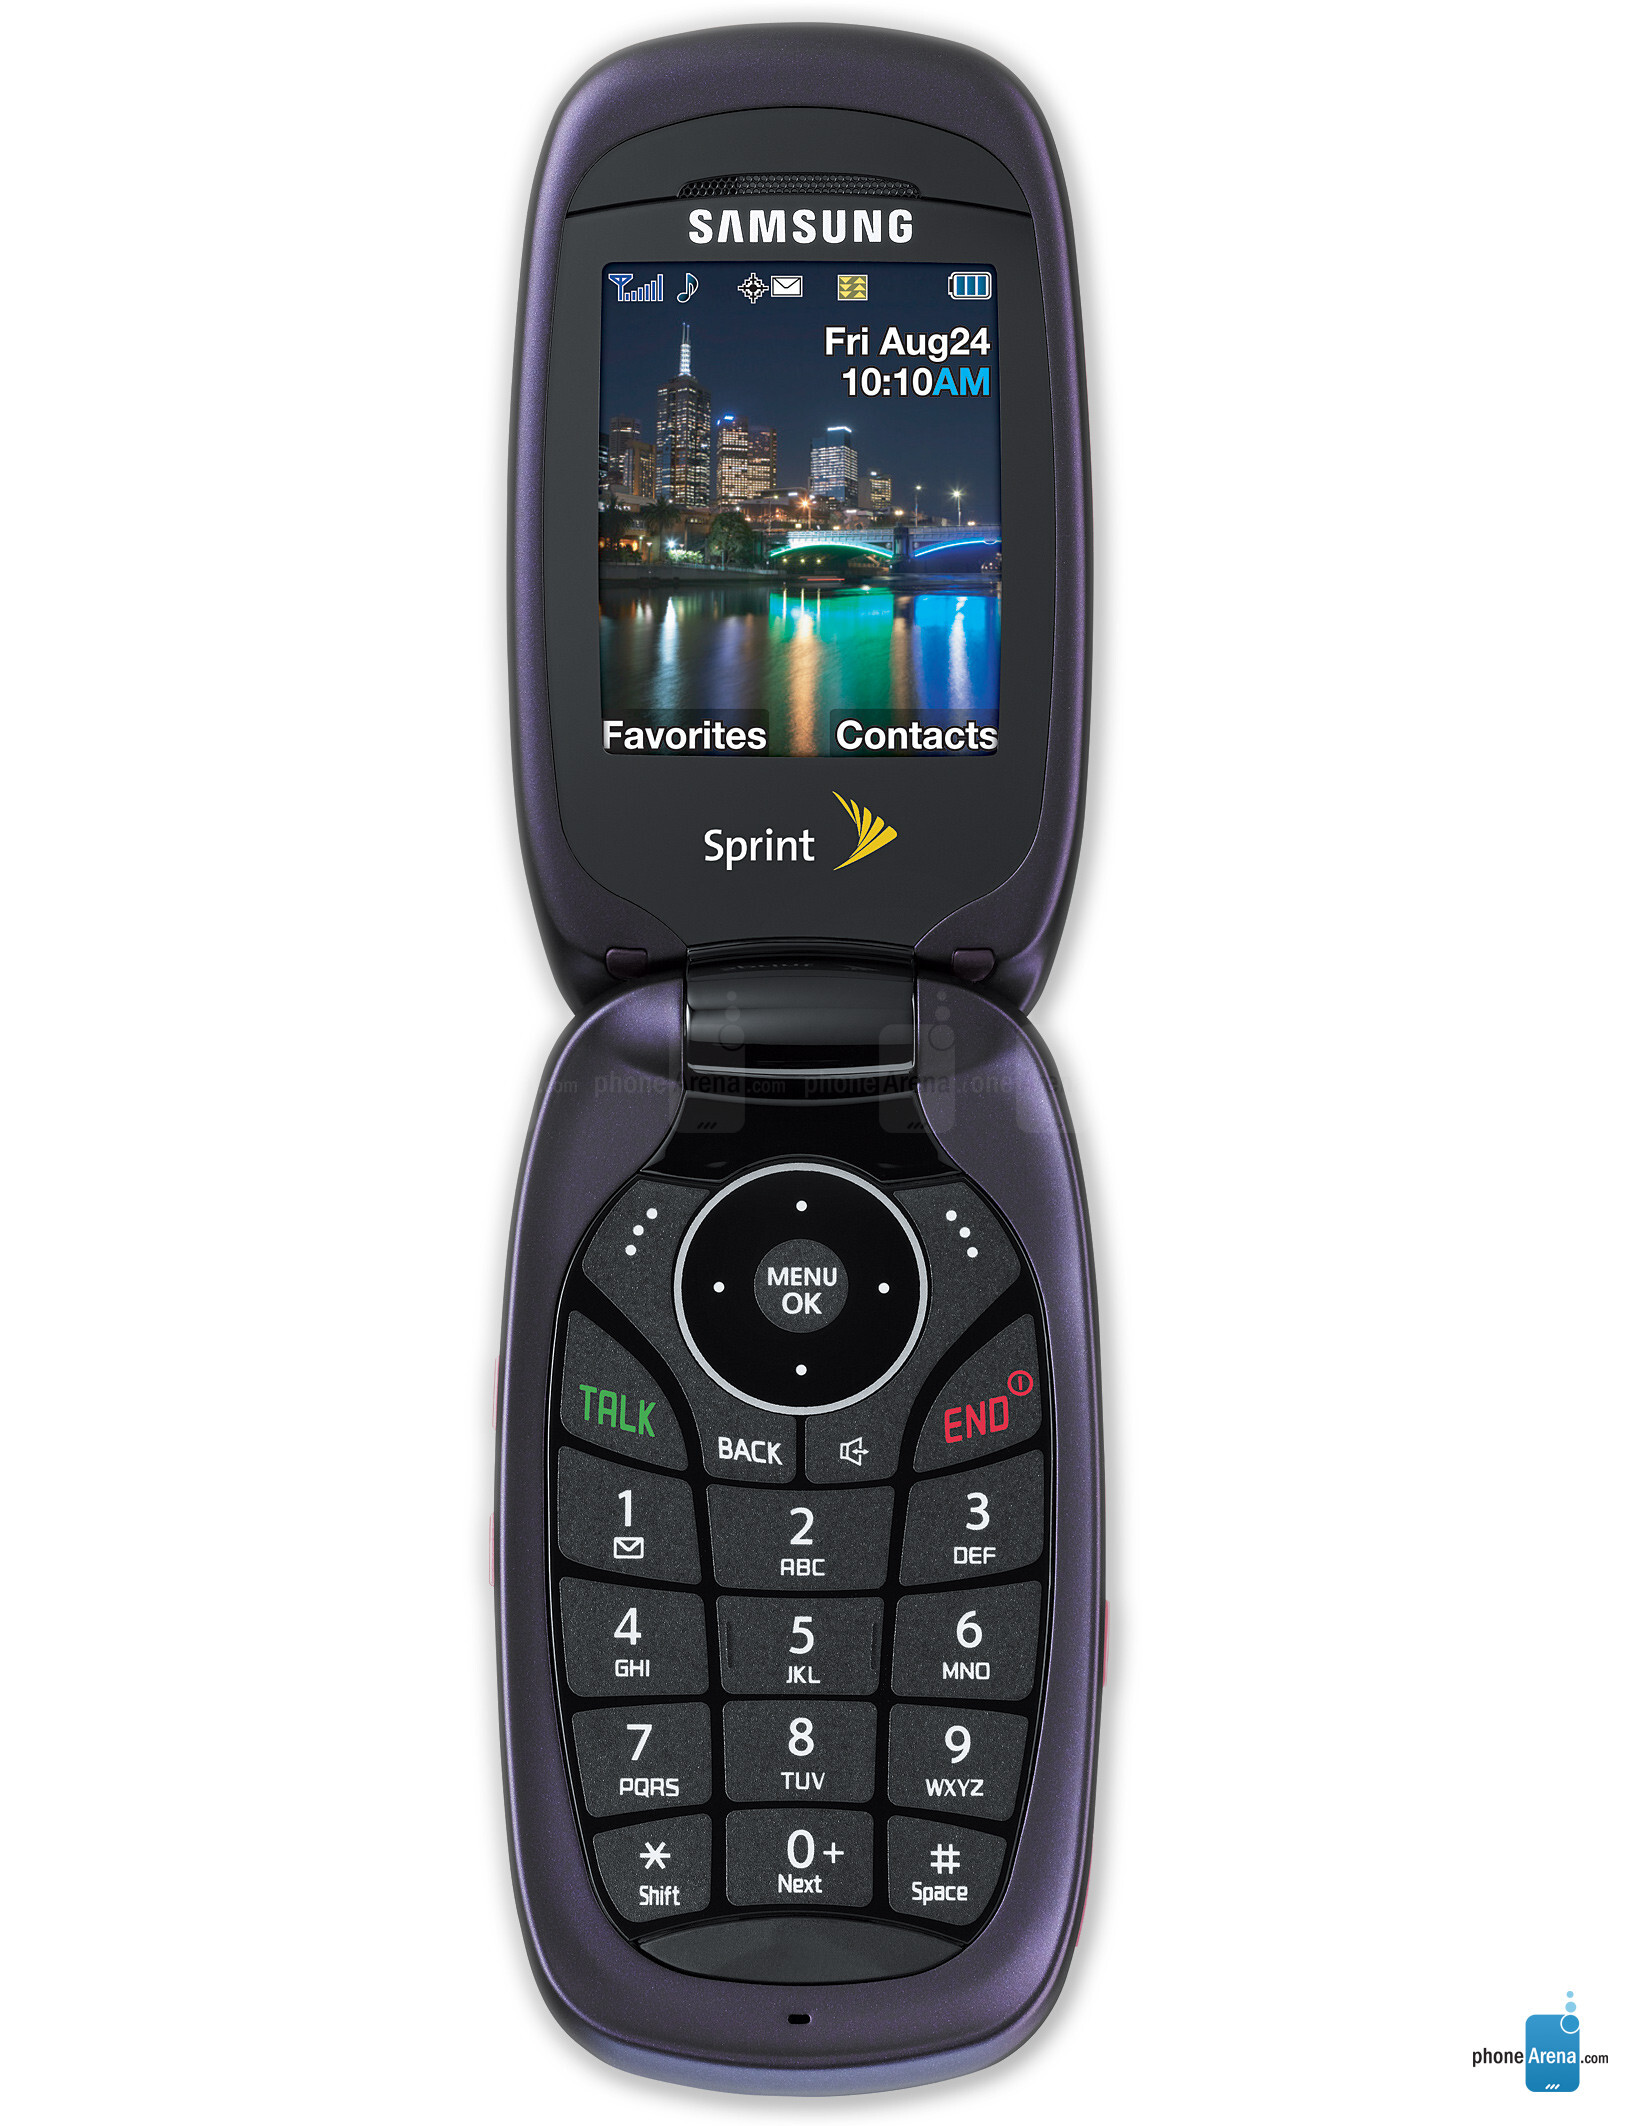 samsung sph m510 photos rh phonearena com Samsung SPH- L900 Samsung Sph- M27